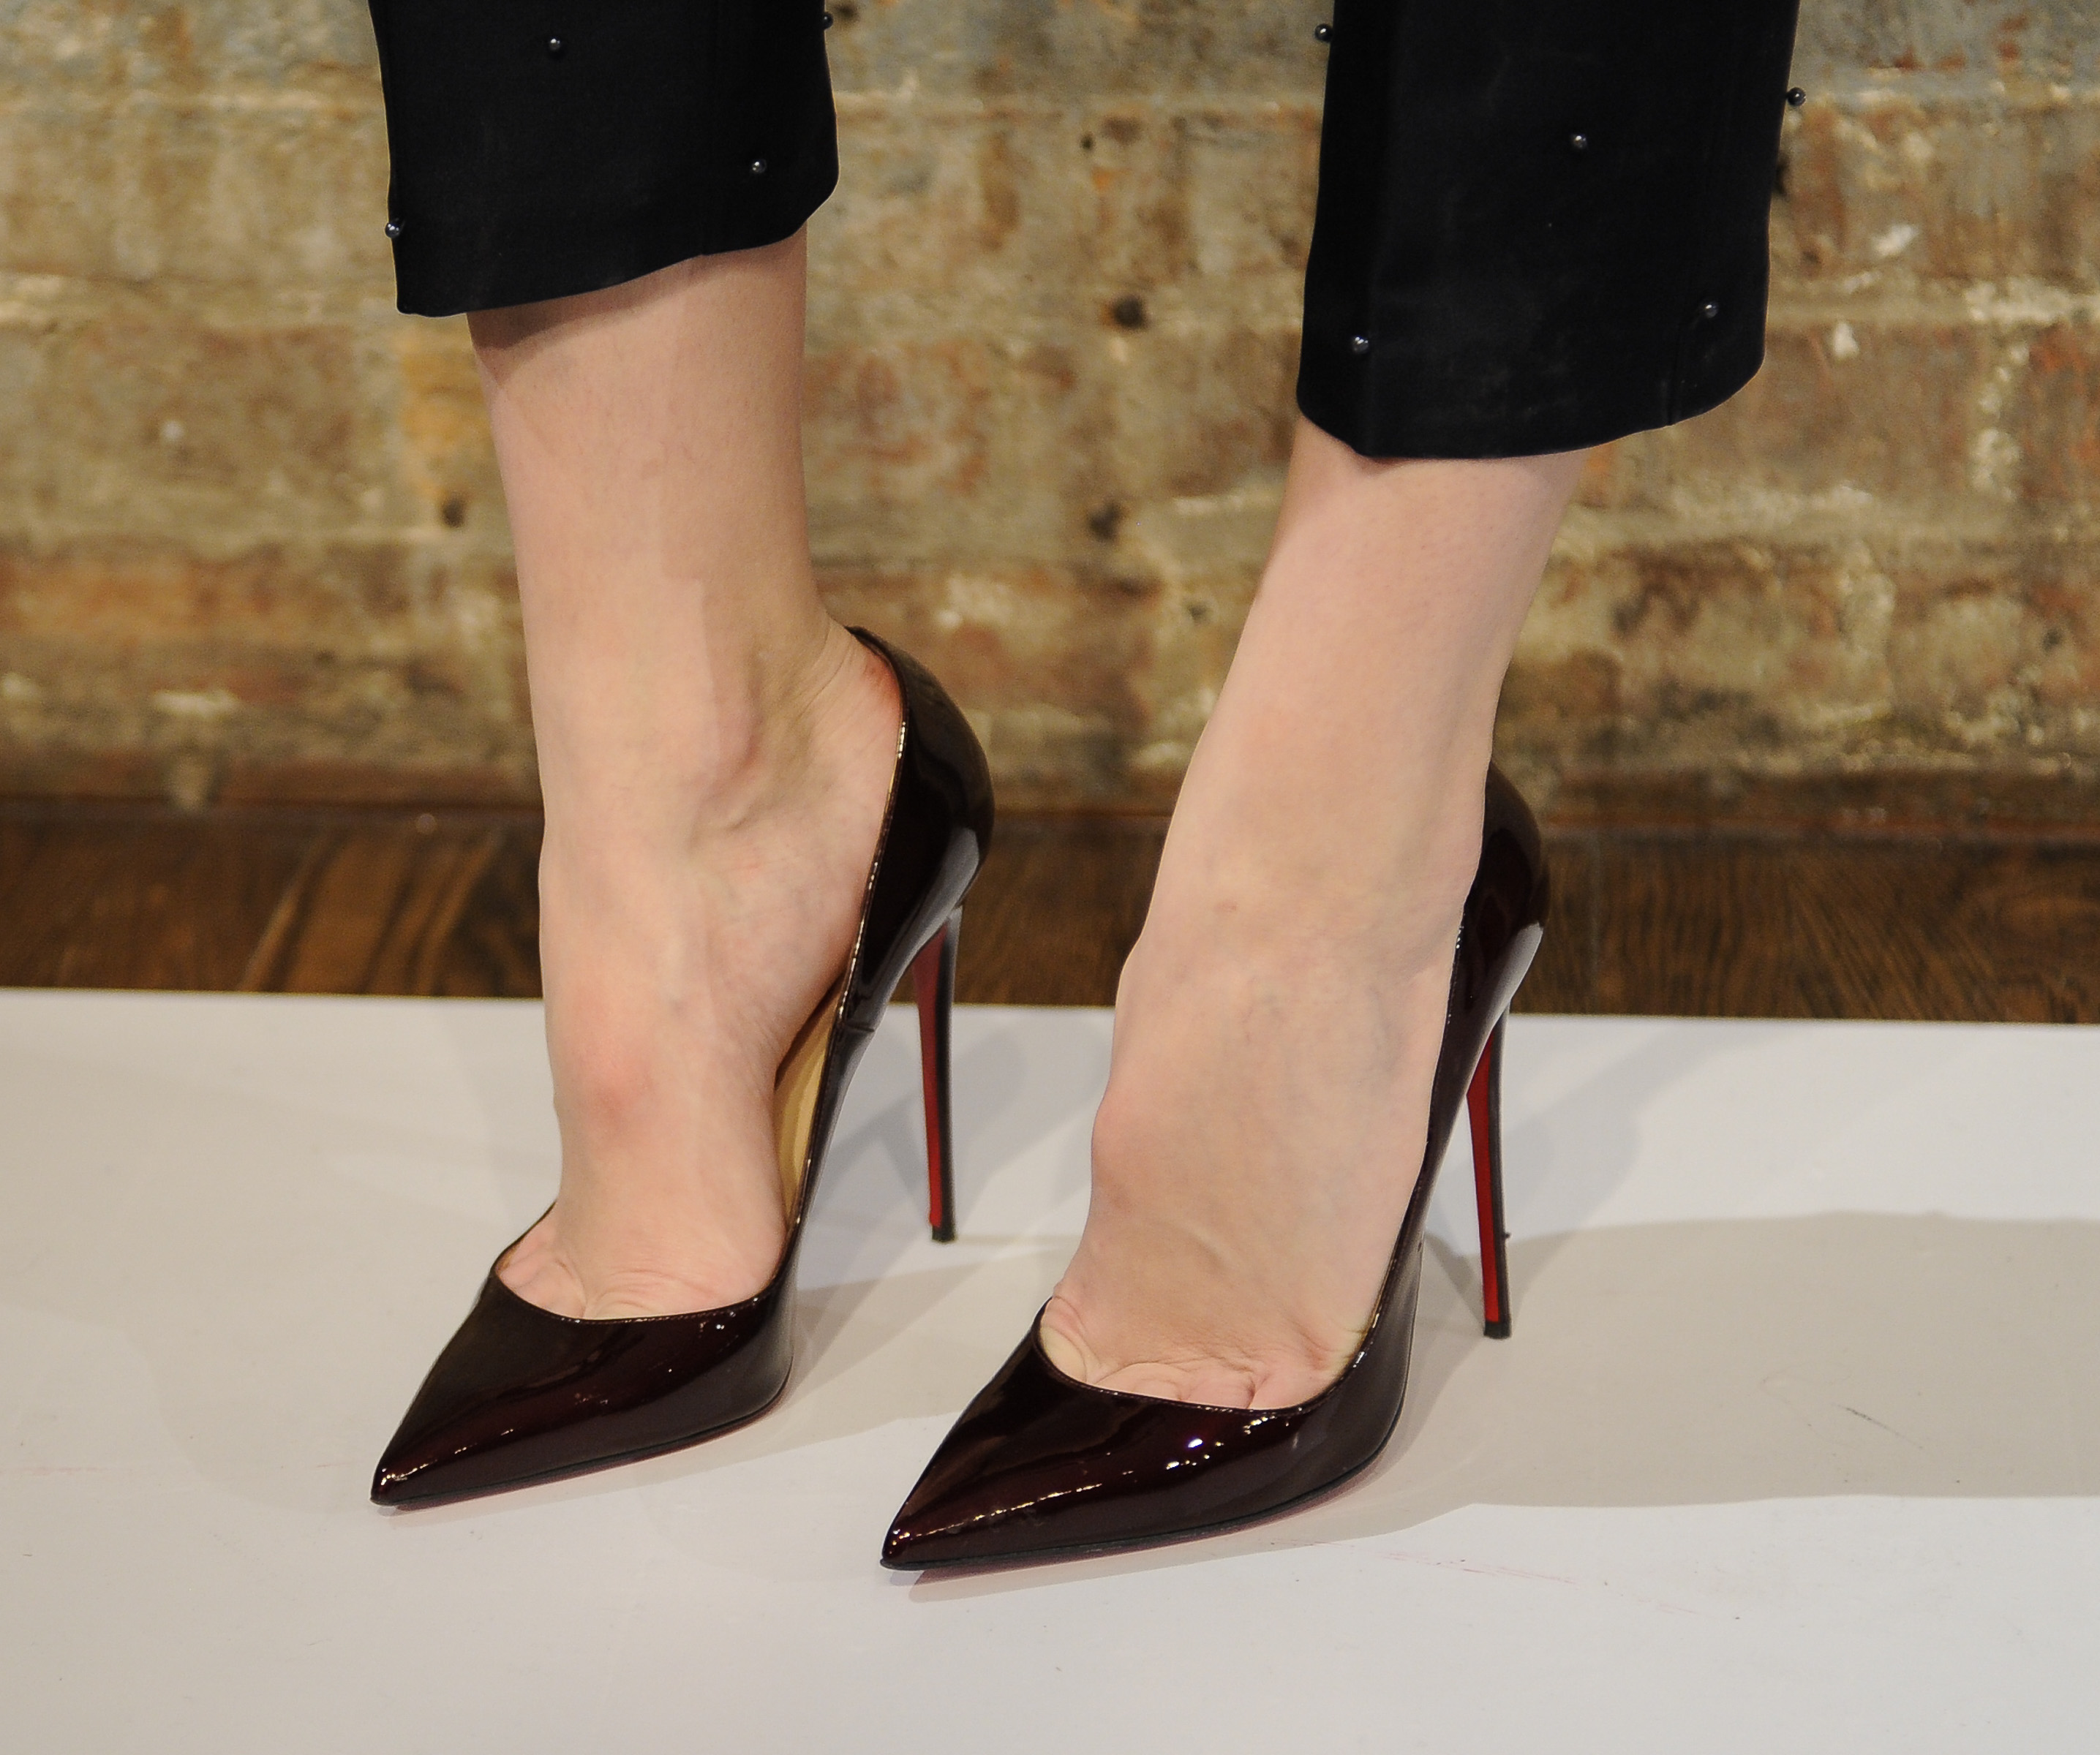 boutique inch stilettos img wine products comfortable fashion comforter heels most avheels